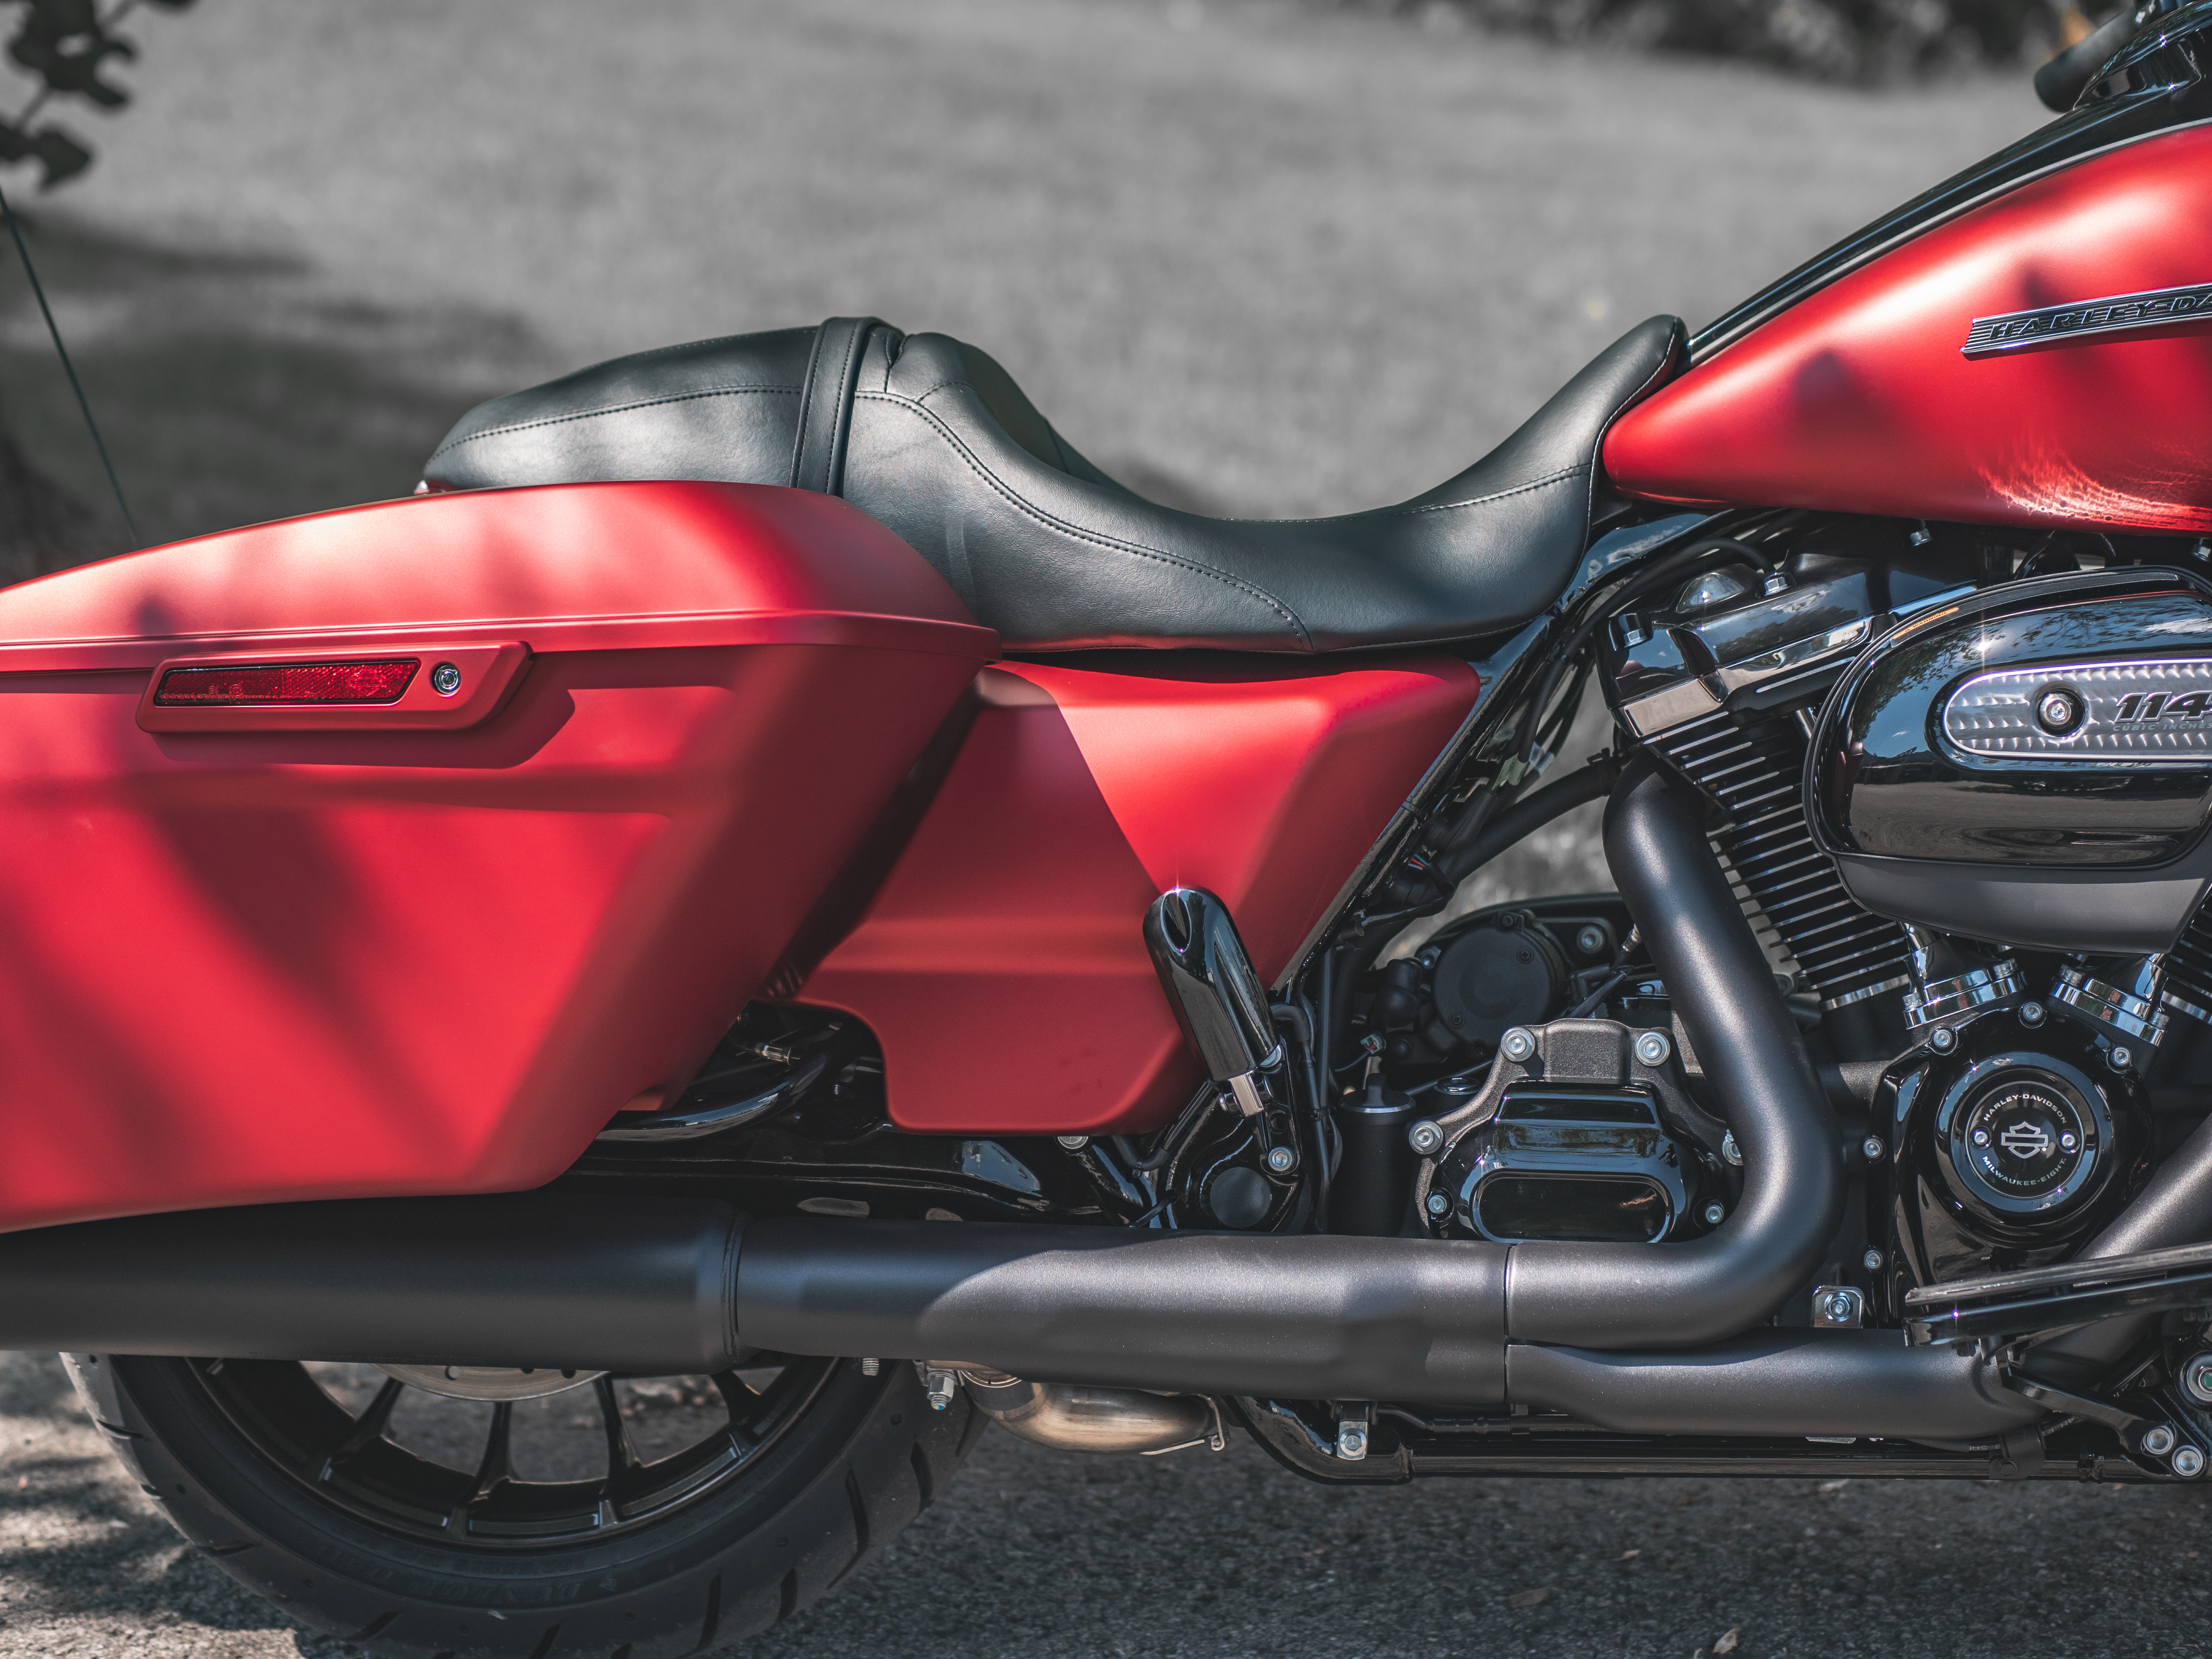 New 2019 Harley-Davidson Street Glide Special in Franklin